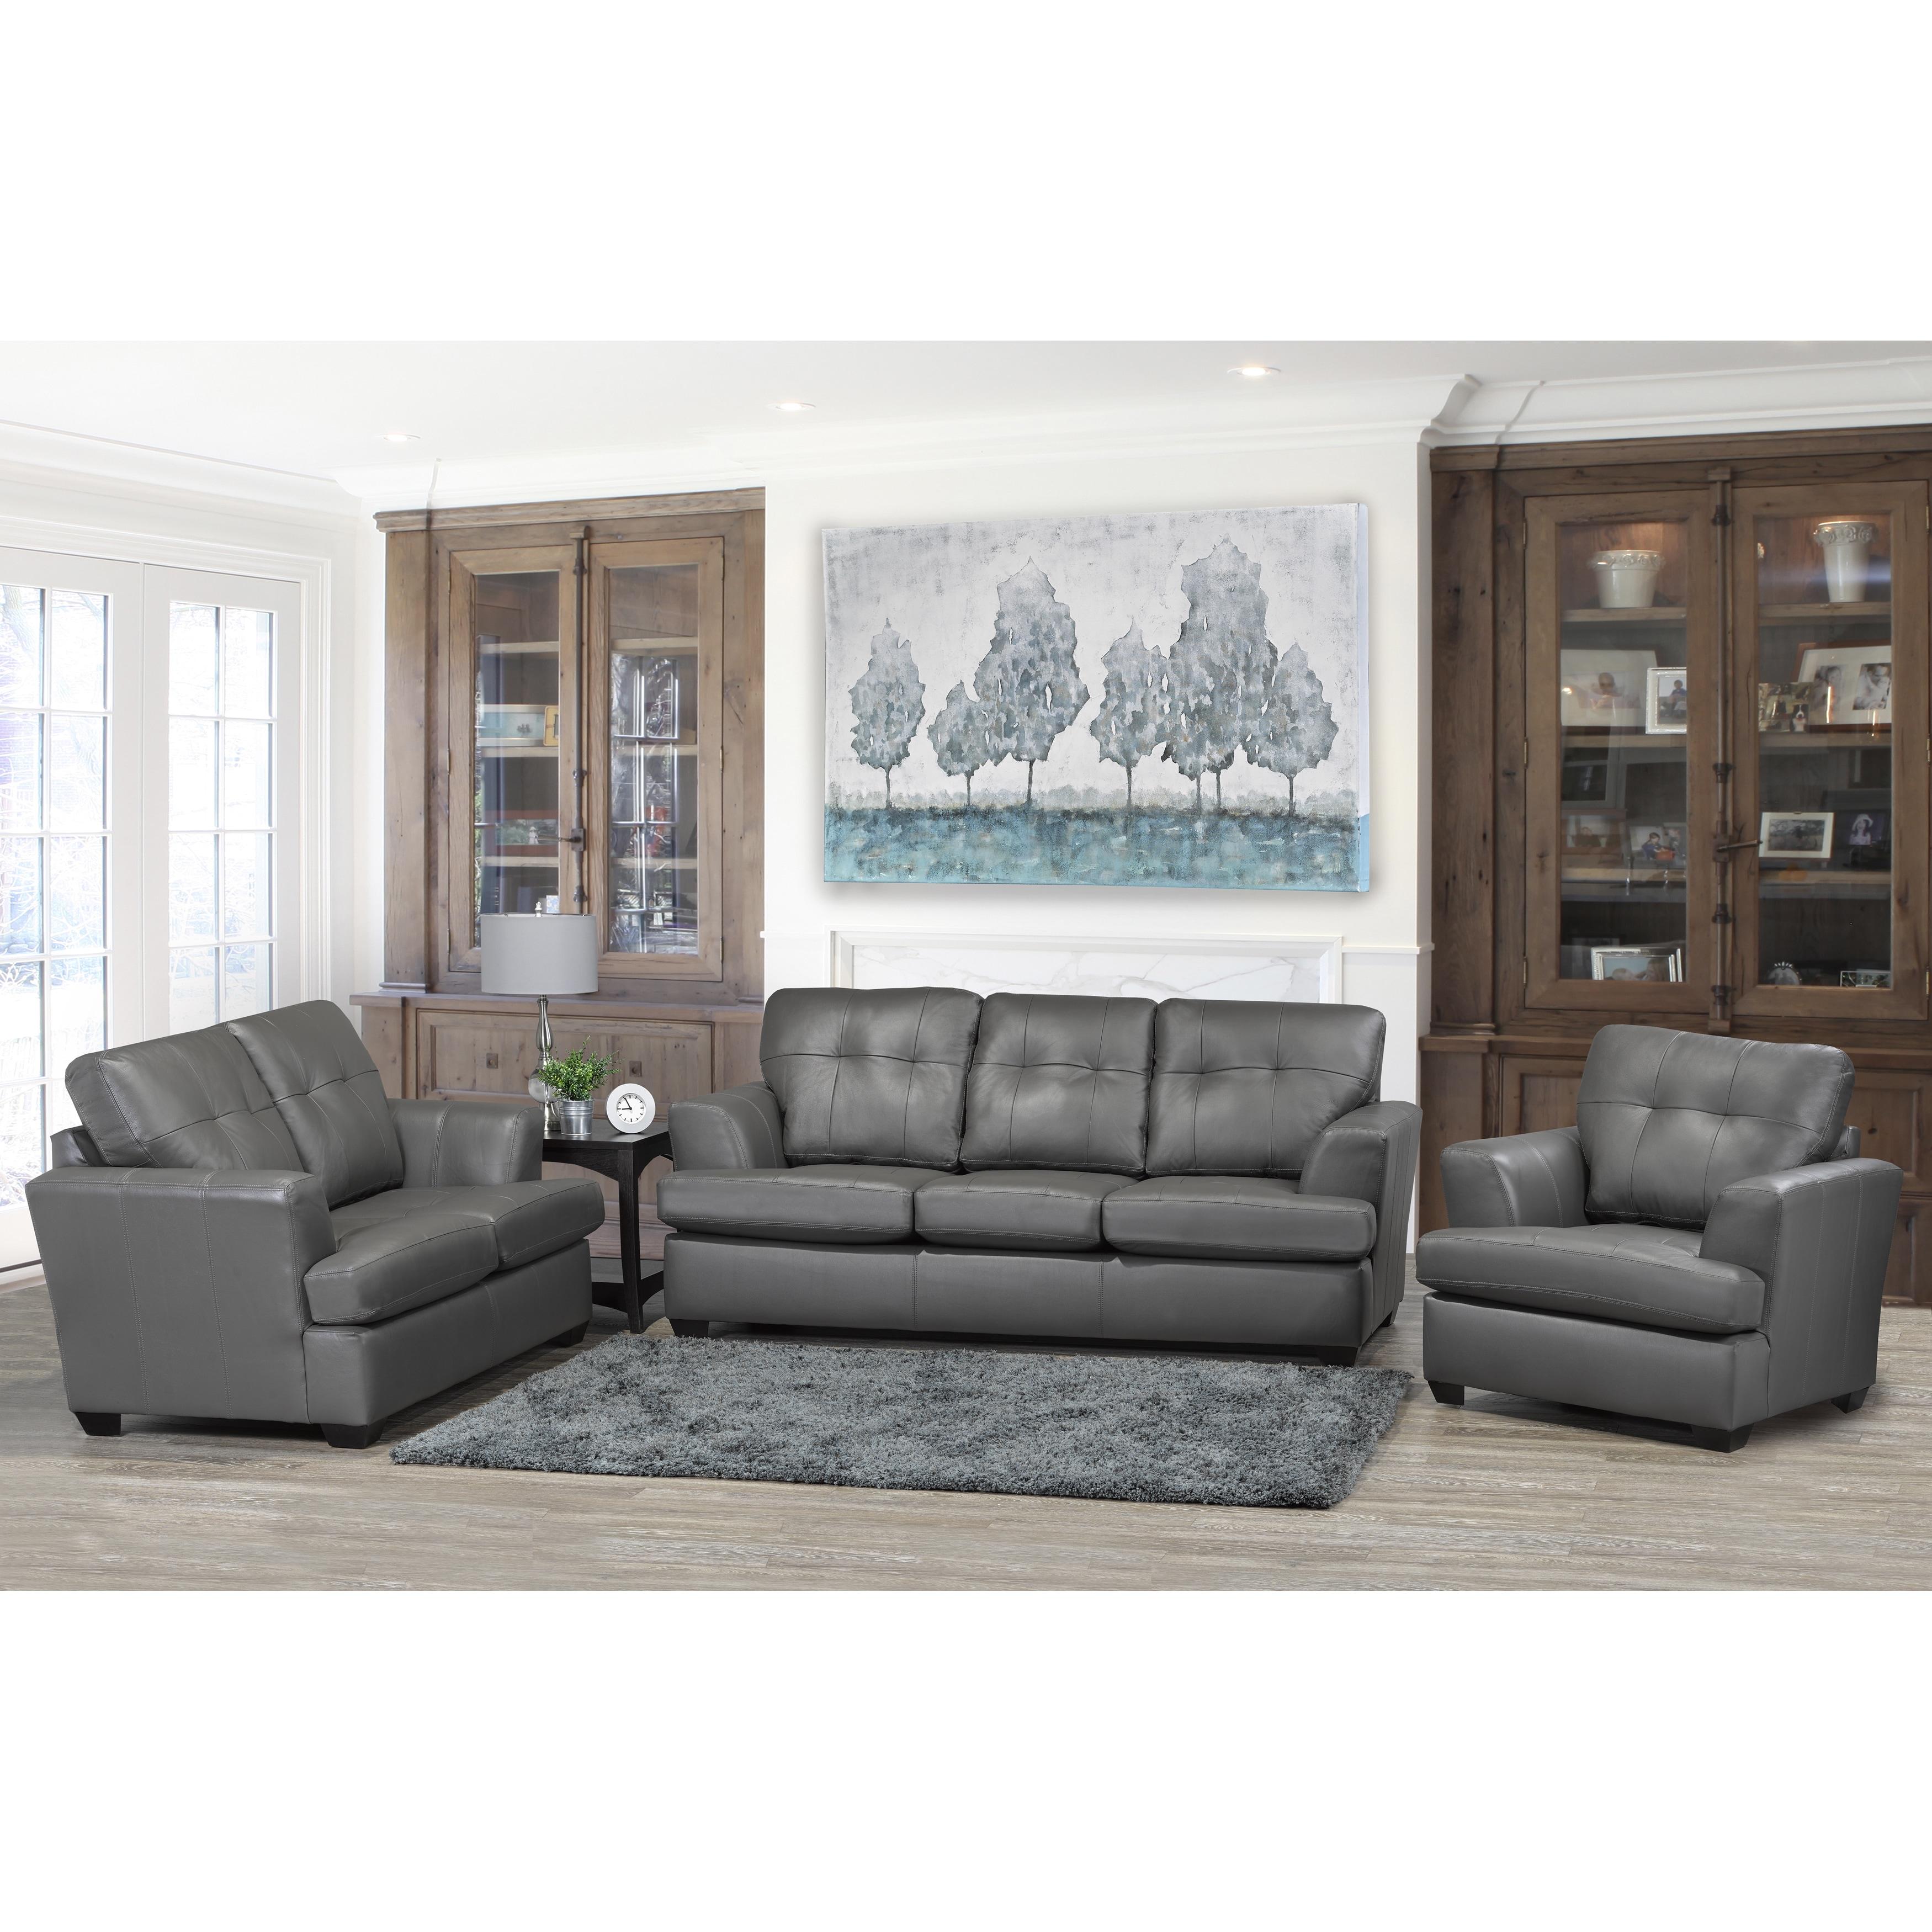 Shop Travis Premium Grey Top Grain Leather Sofa, Loveseat and Chair ...